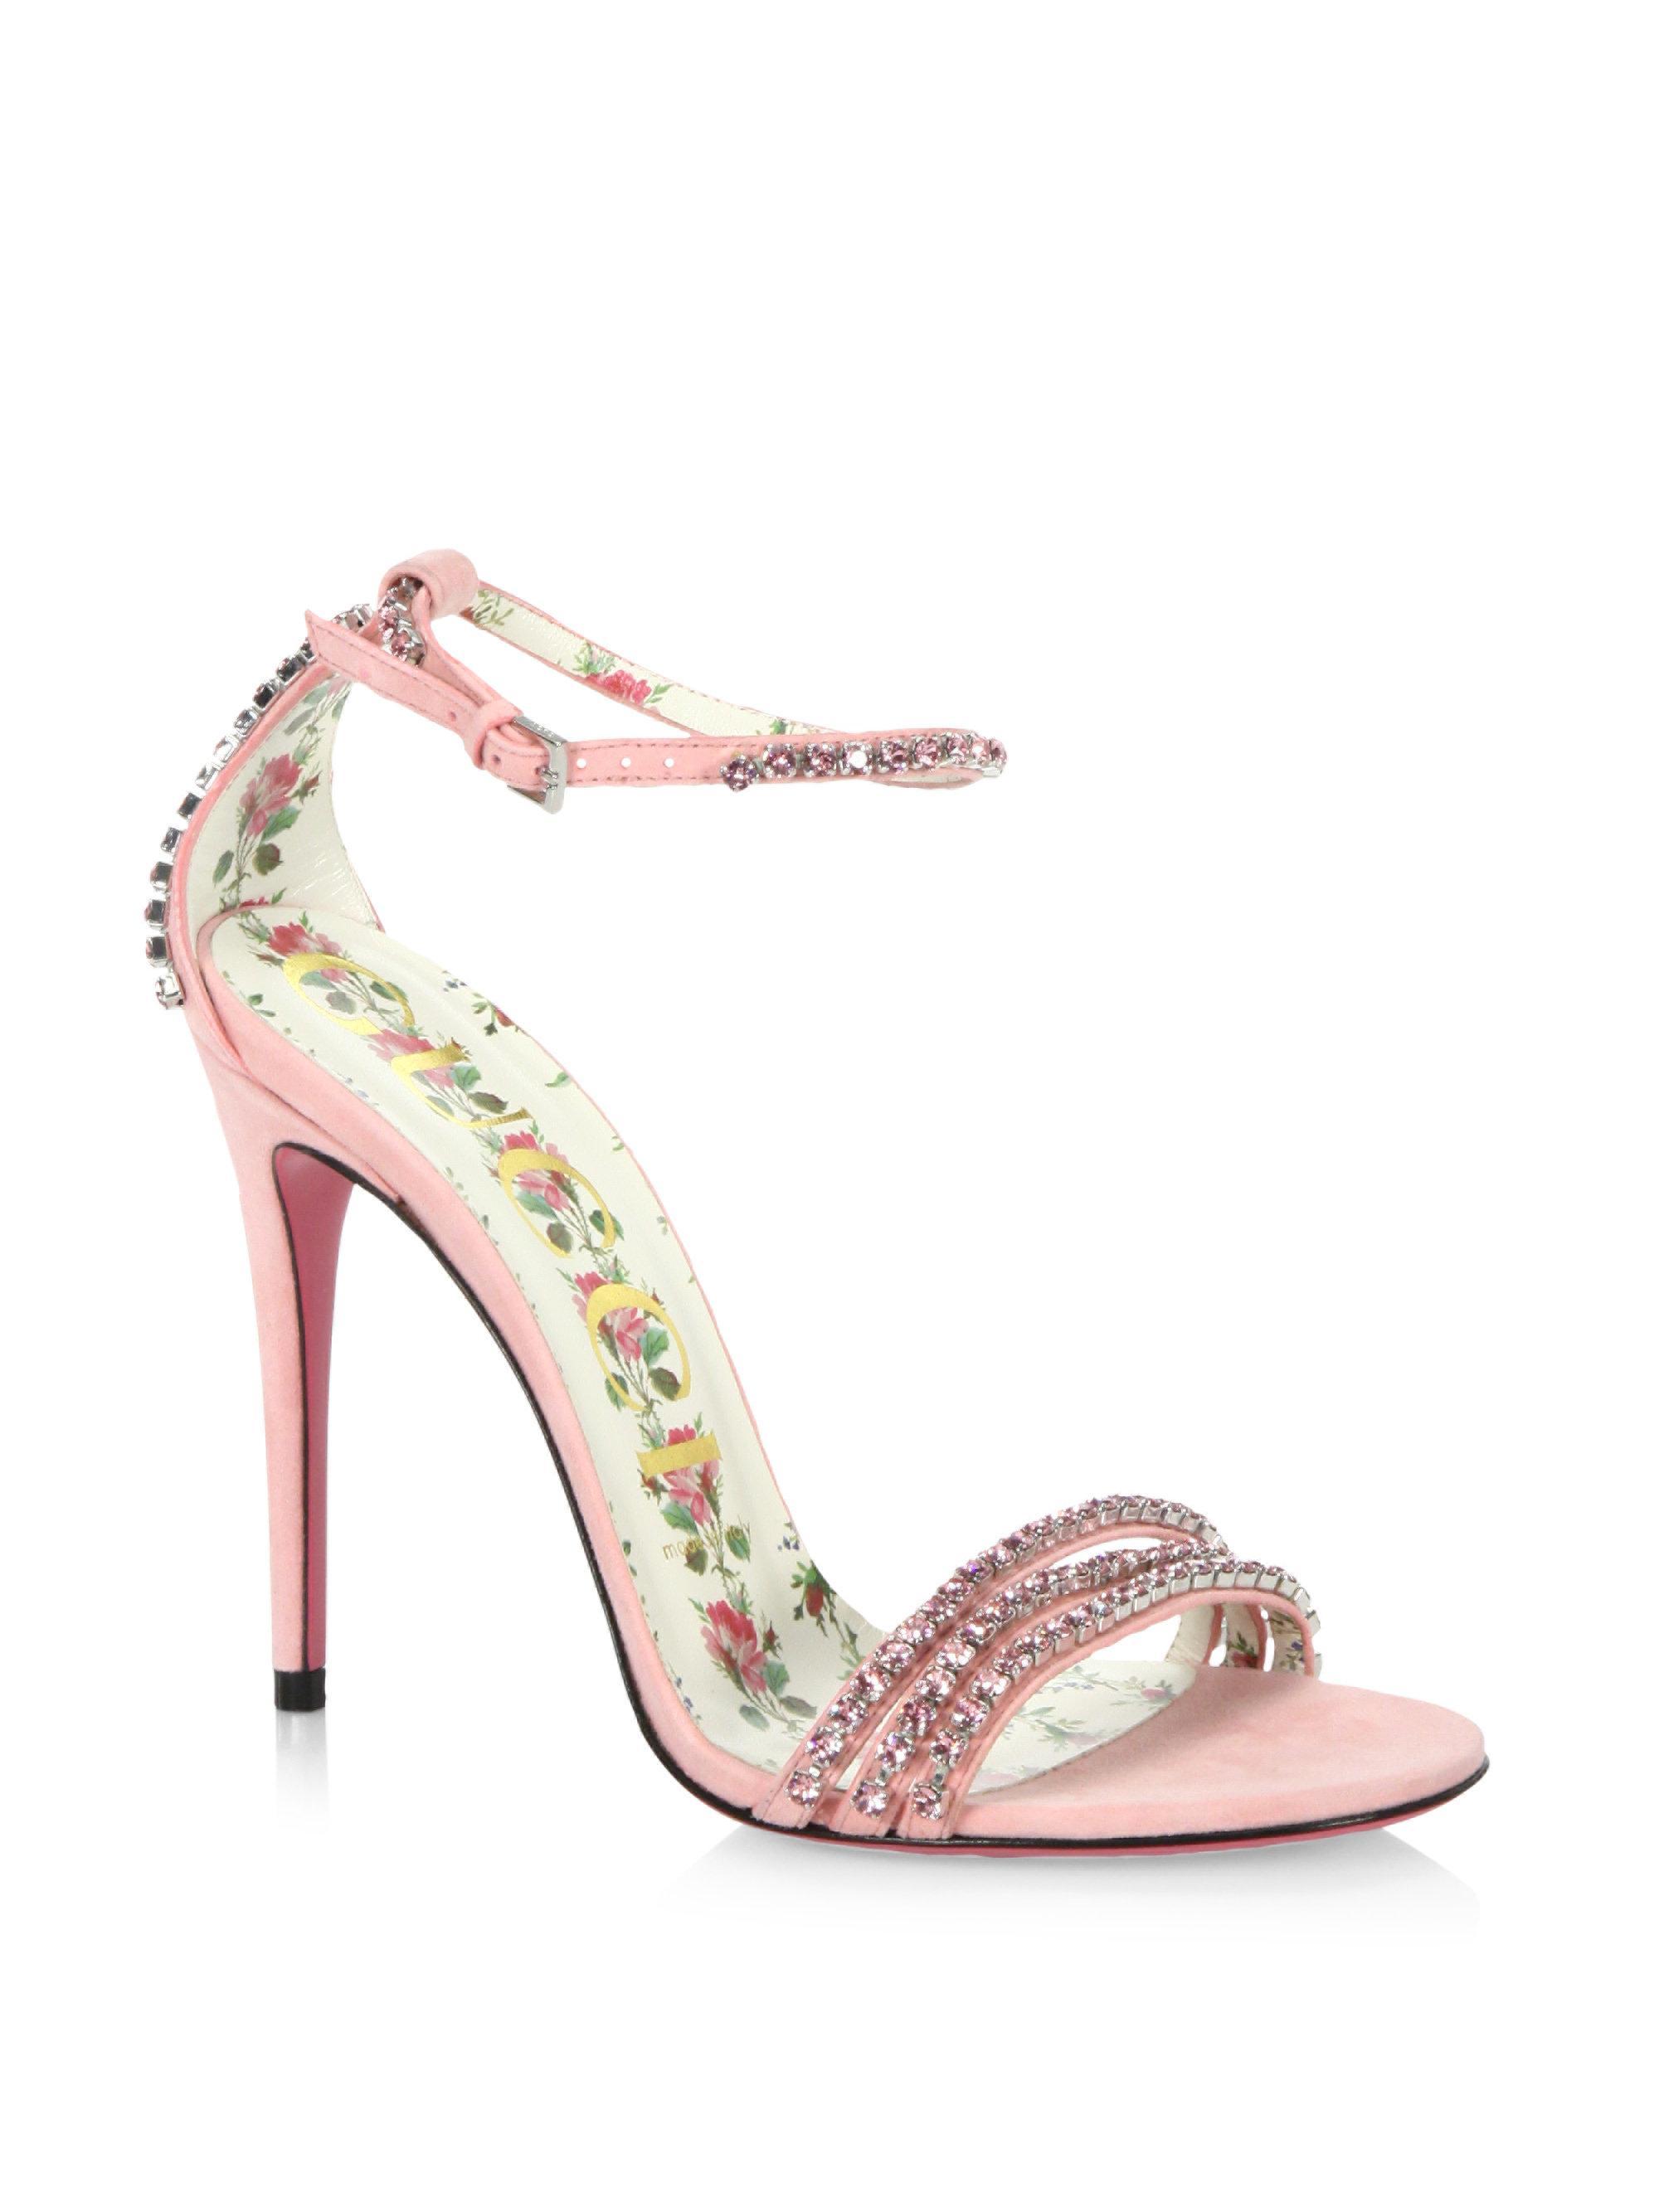 Gucci Isle Jewel Suede Sandals w7jsBo